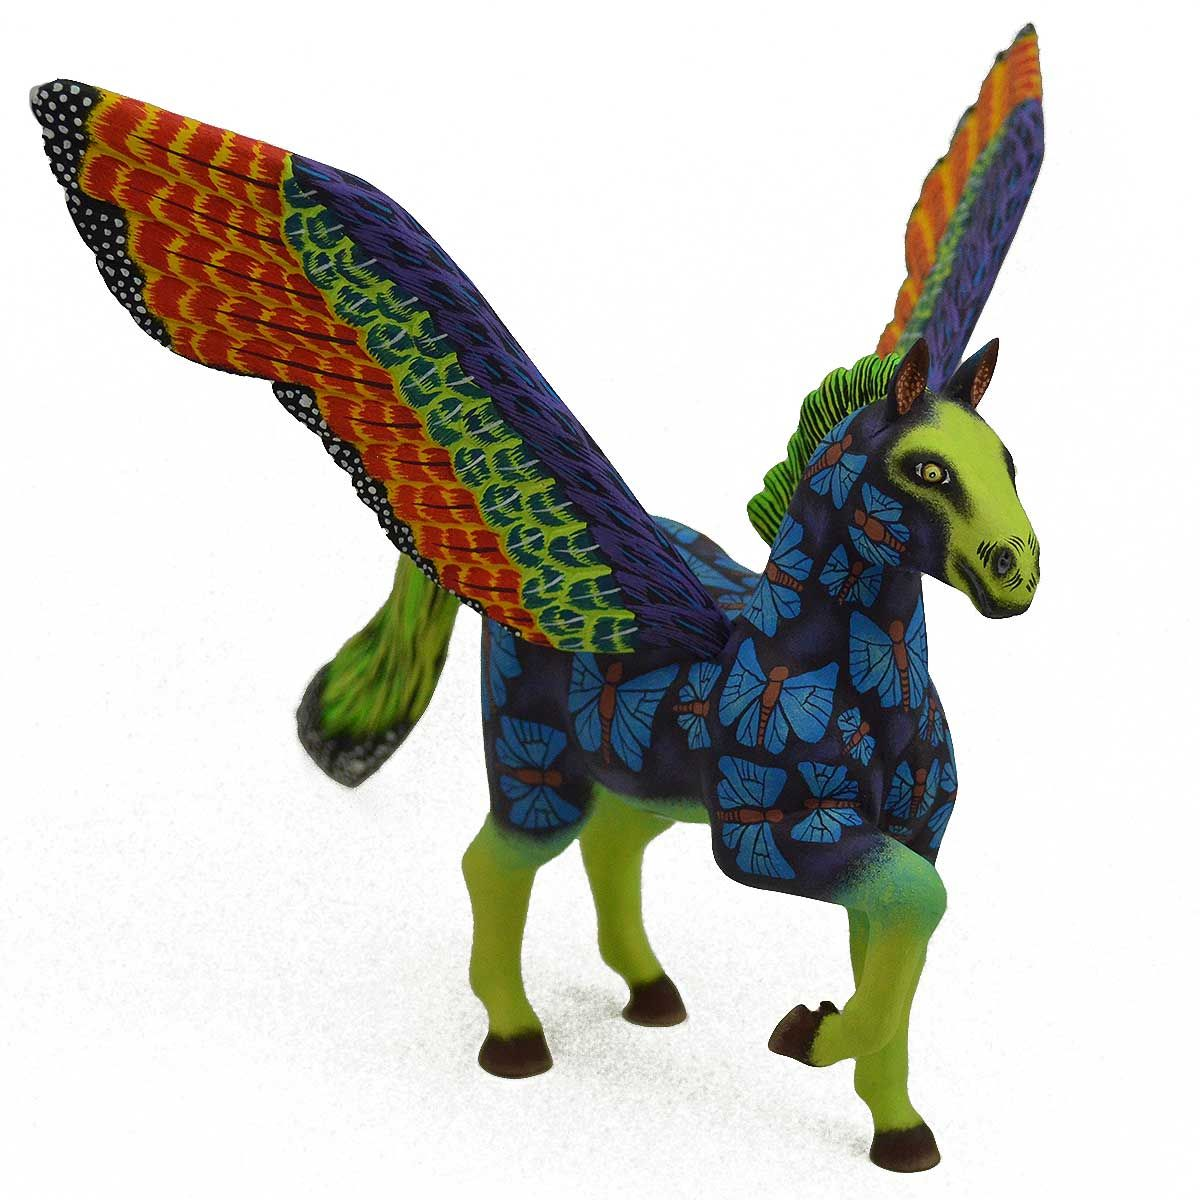 Eleazar Morales Butterfly Pegasus Mexican folk art, La art